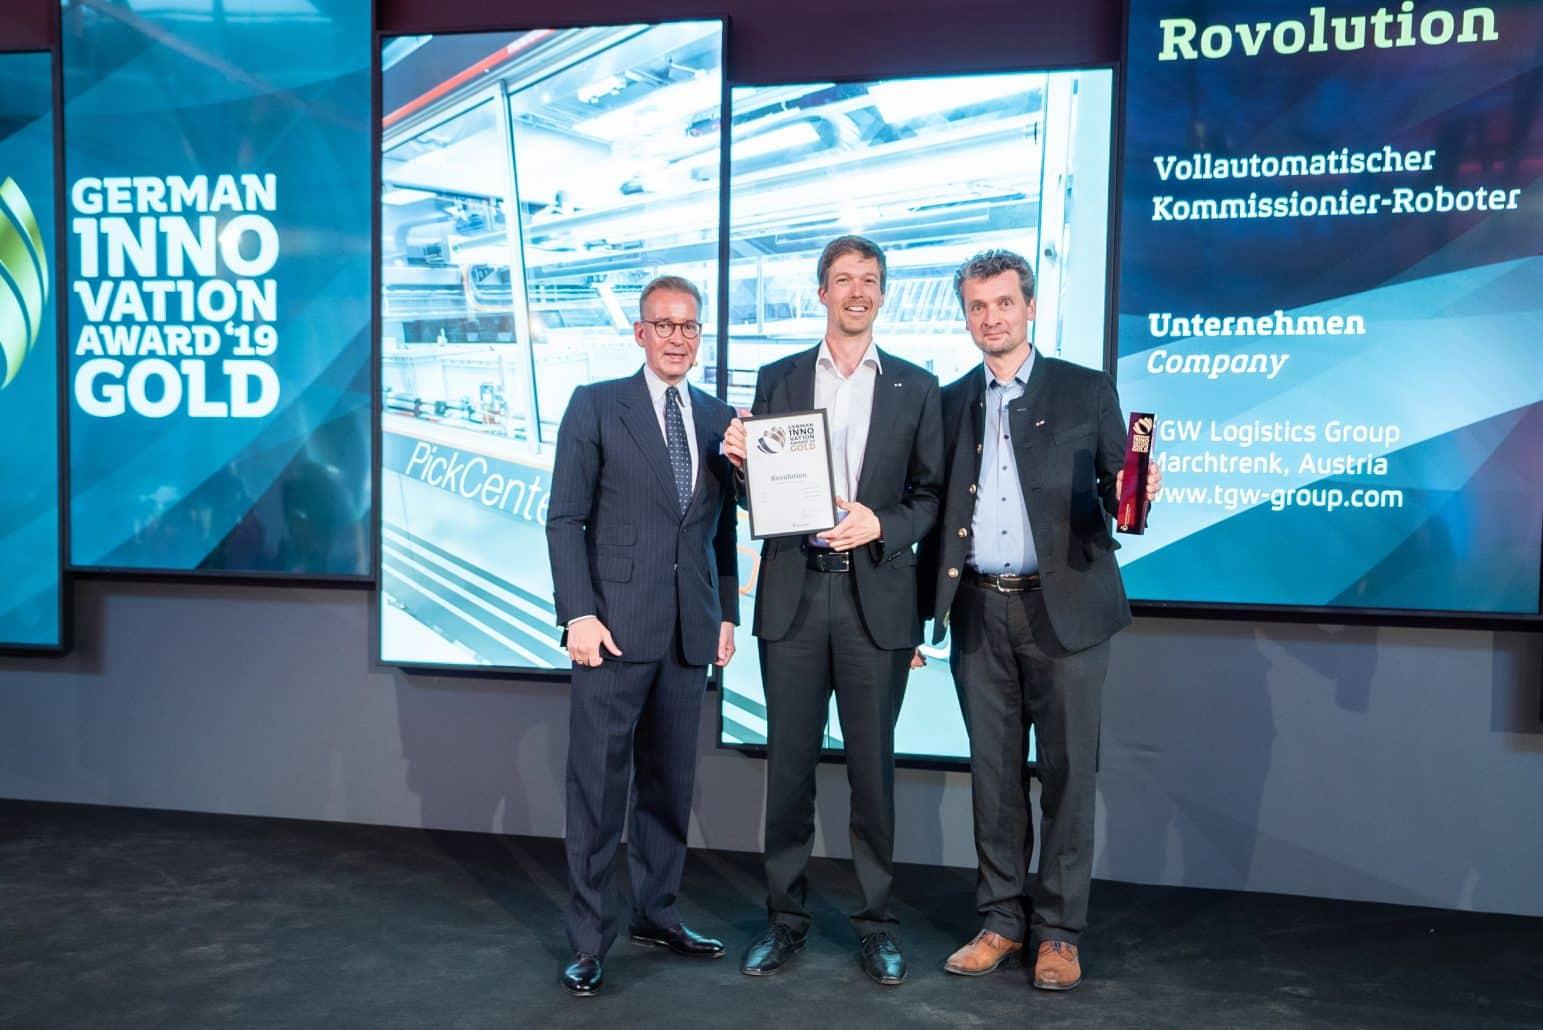 TGW gewinnt German Innovation Award 2019 in Gold